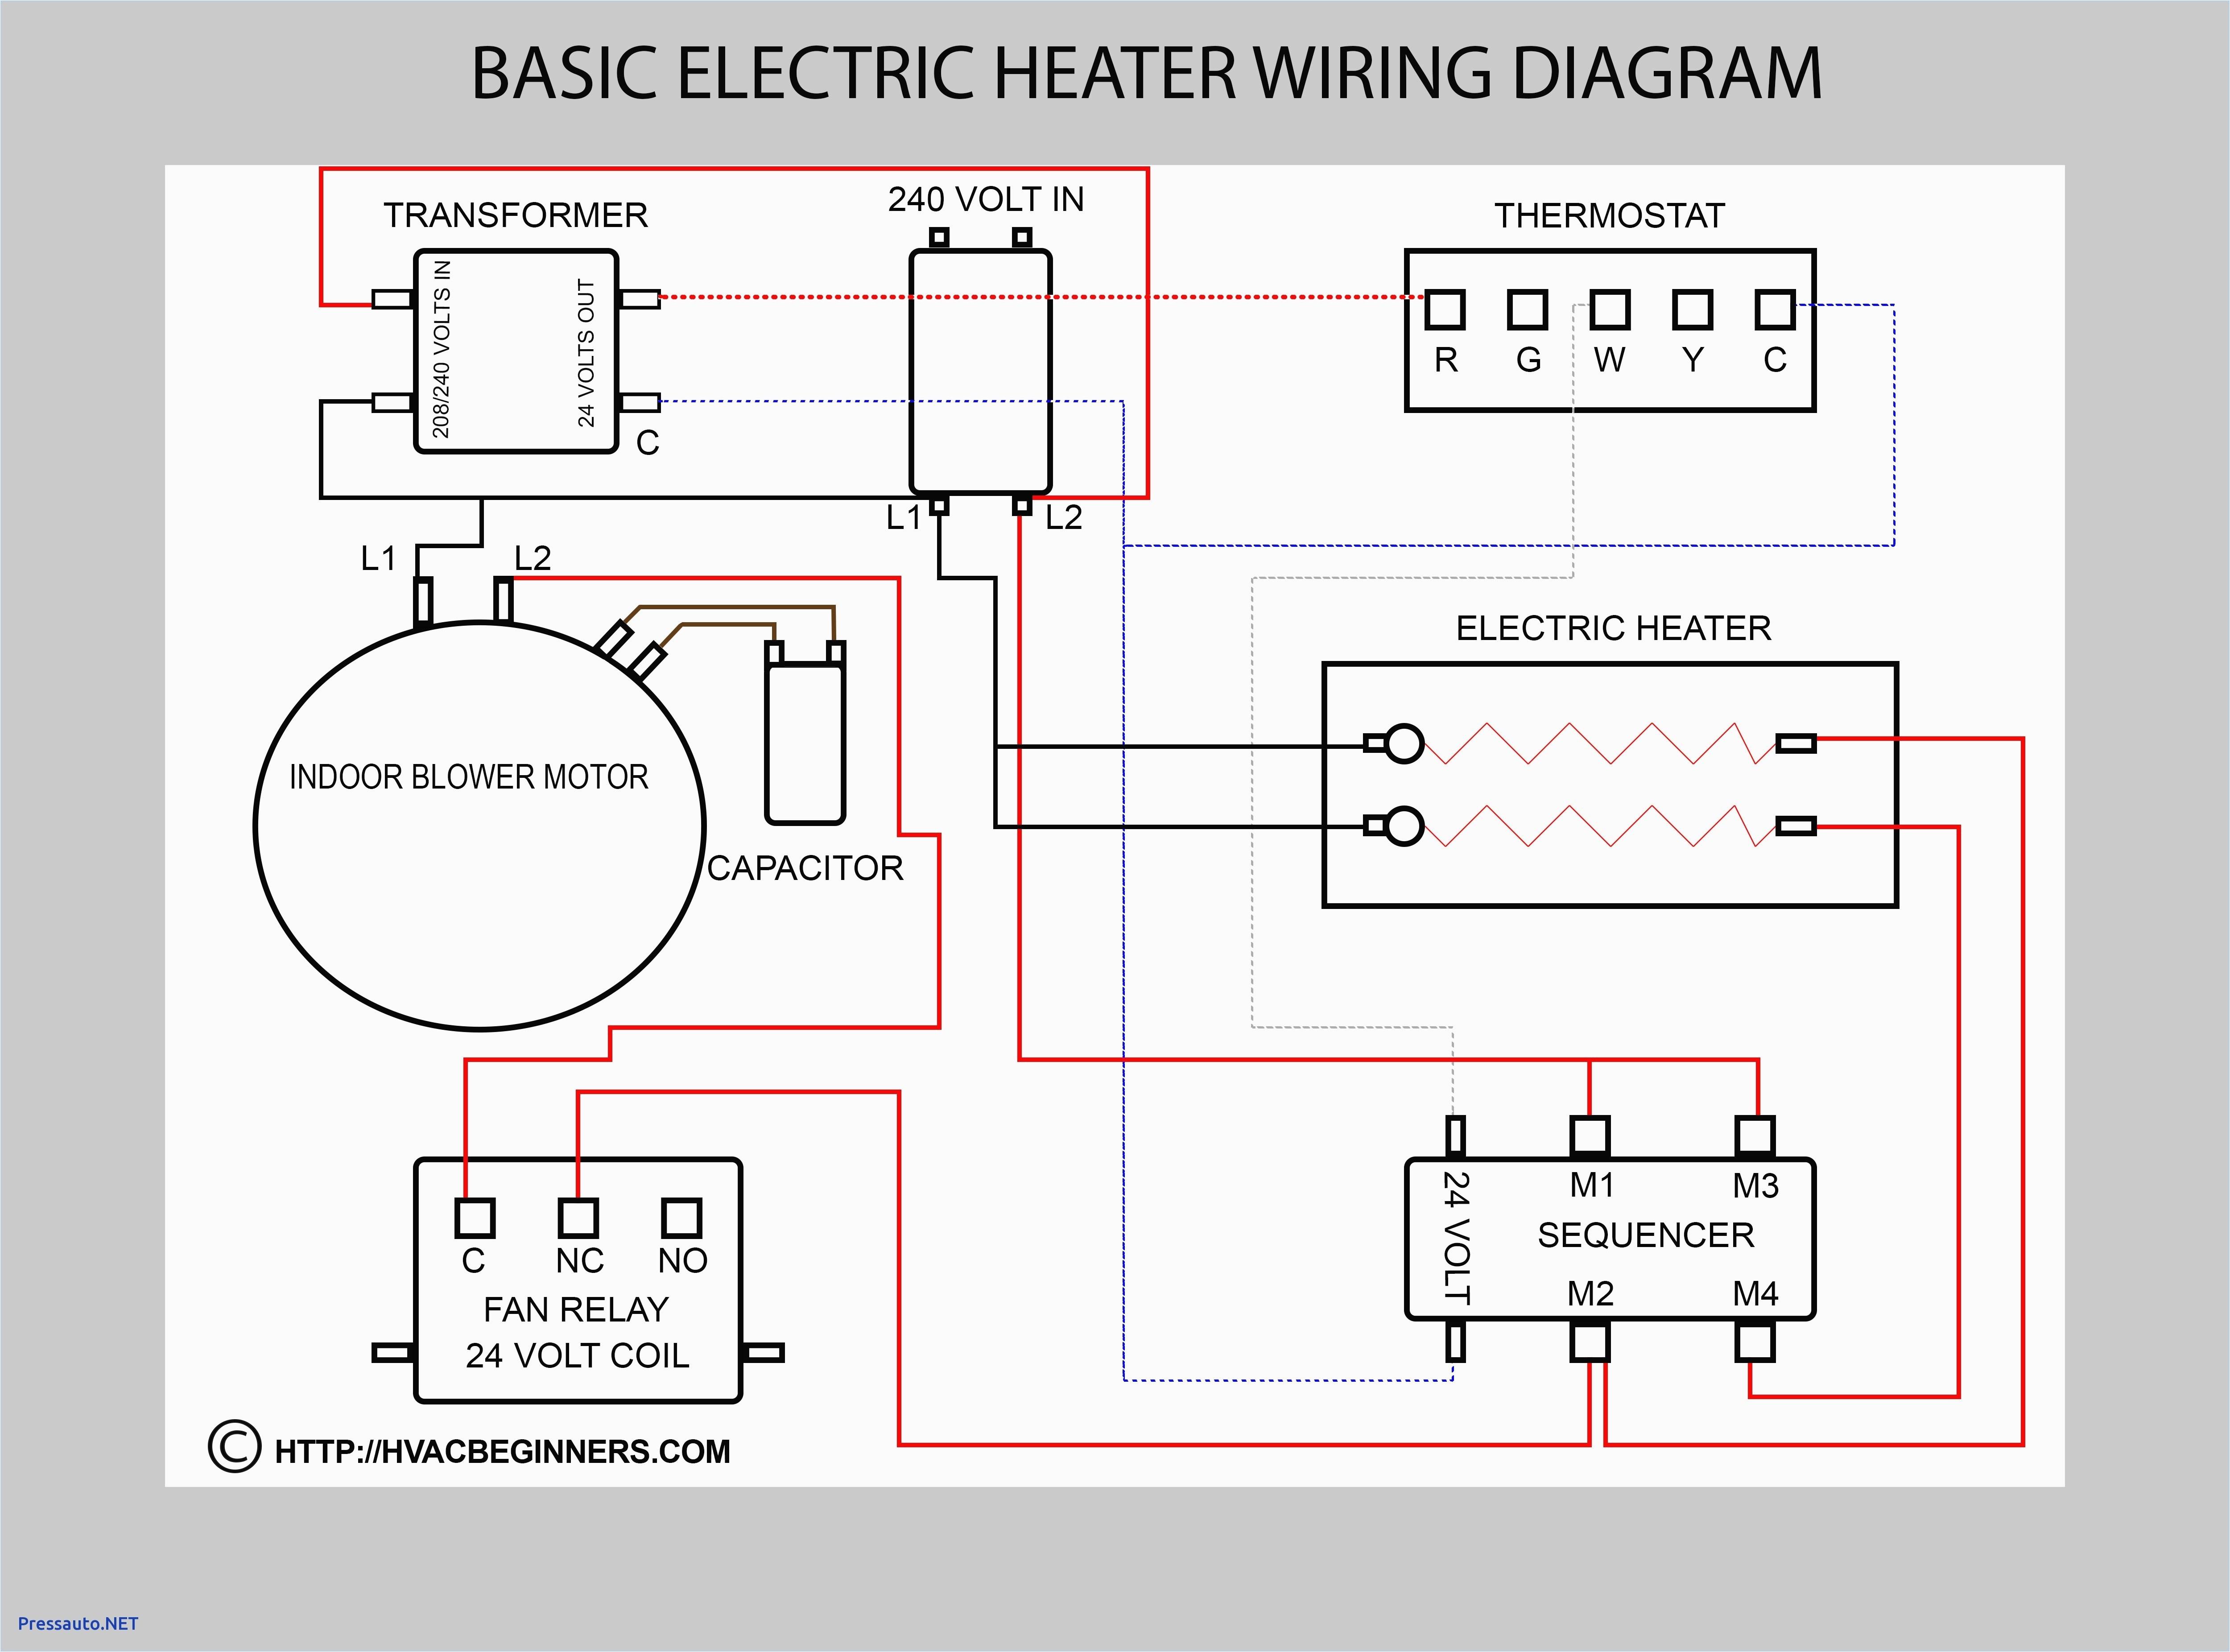 image of wiring diagram for 220 volt baseboard heater wiring 220 volt baseboard heater trusted wiring diagram online240v electrical wiring baseboard heater diagram electric trusted png